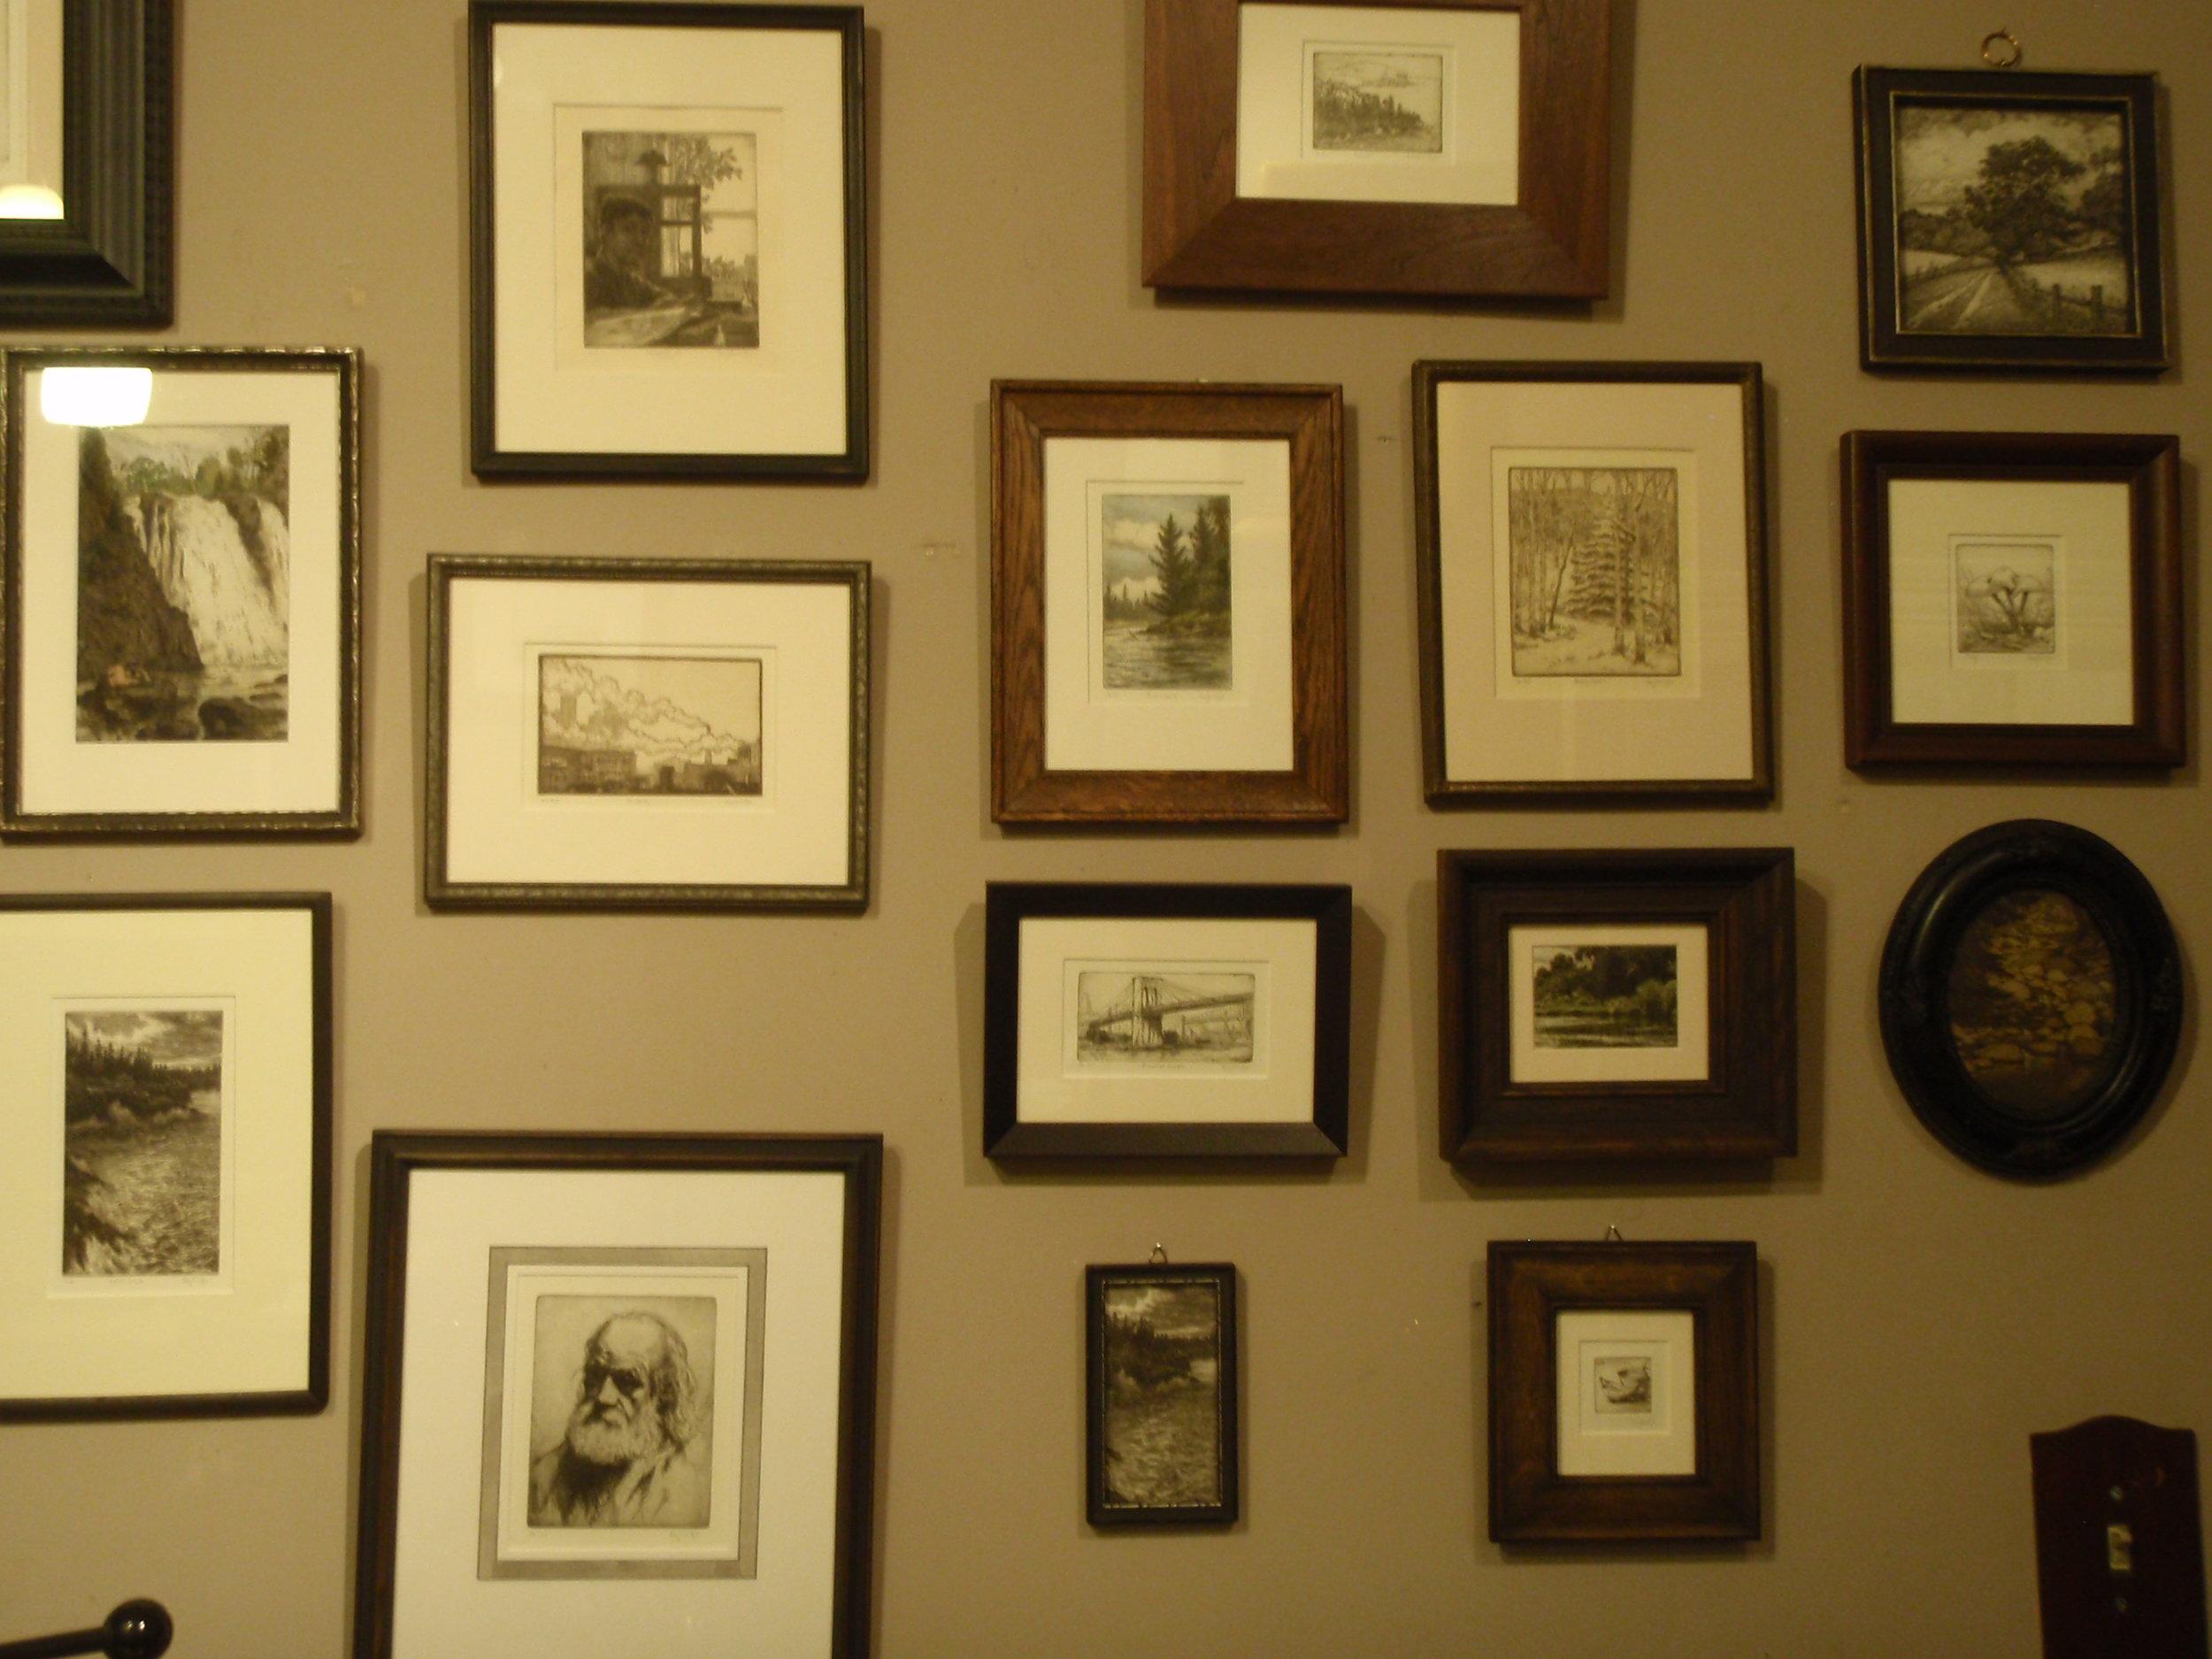 Loughridge Studio of Fine Art - 265 West 7th Street, Saint Paul MN 55102